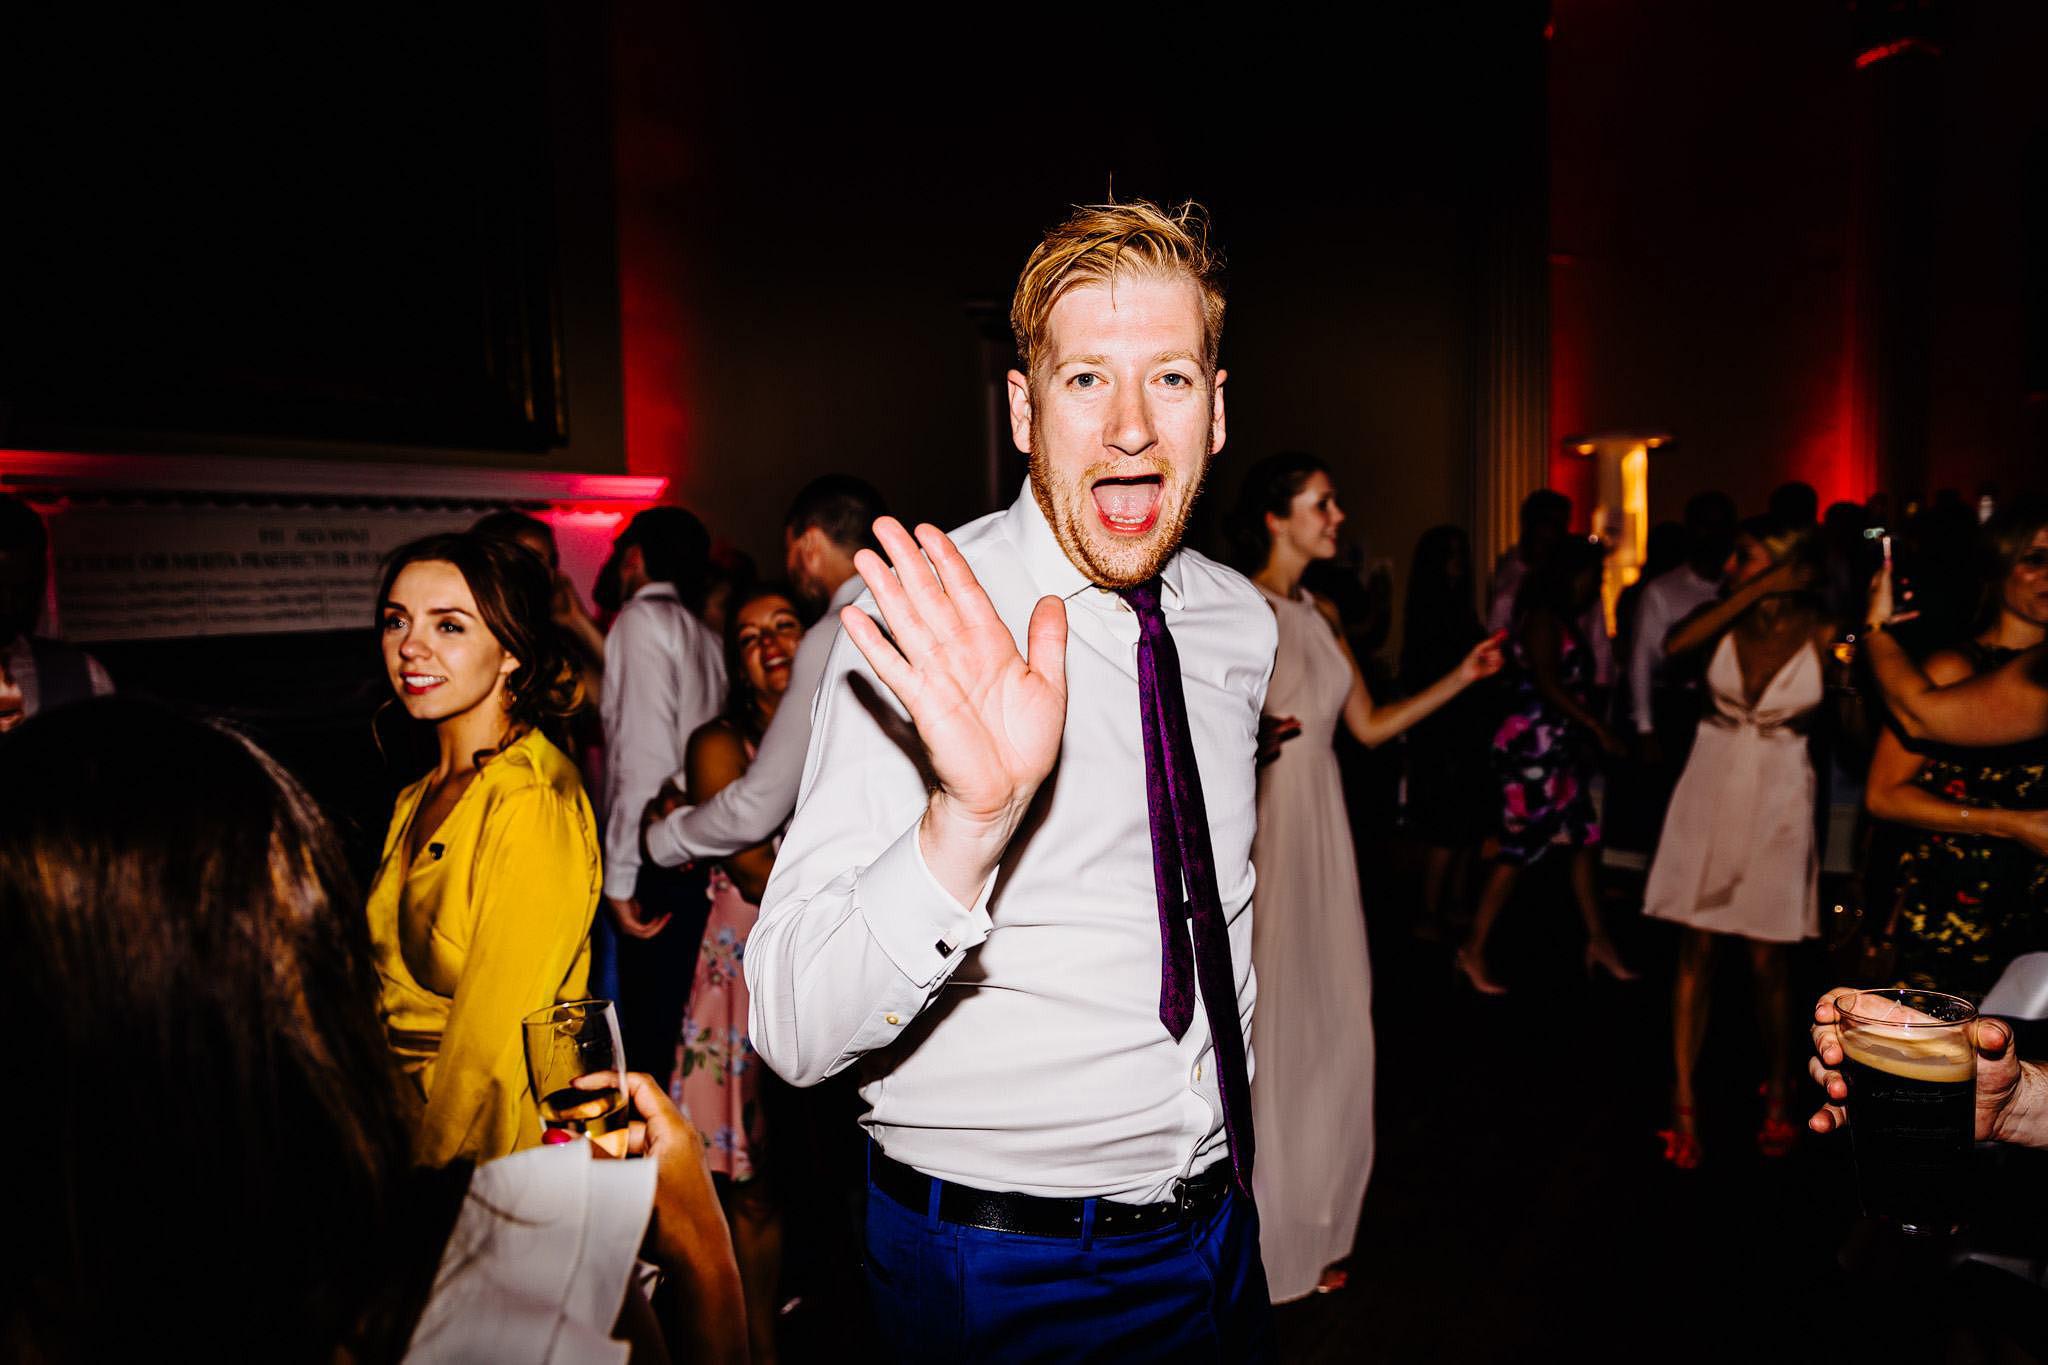 funny wedding pics